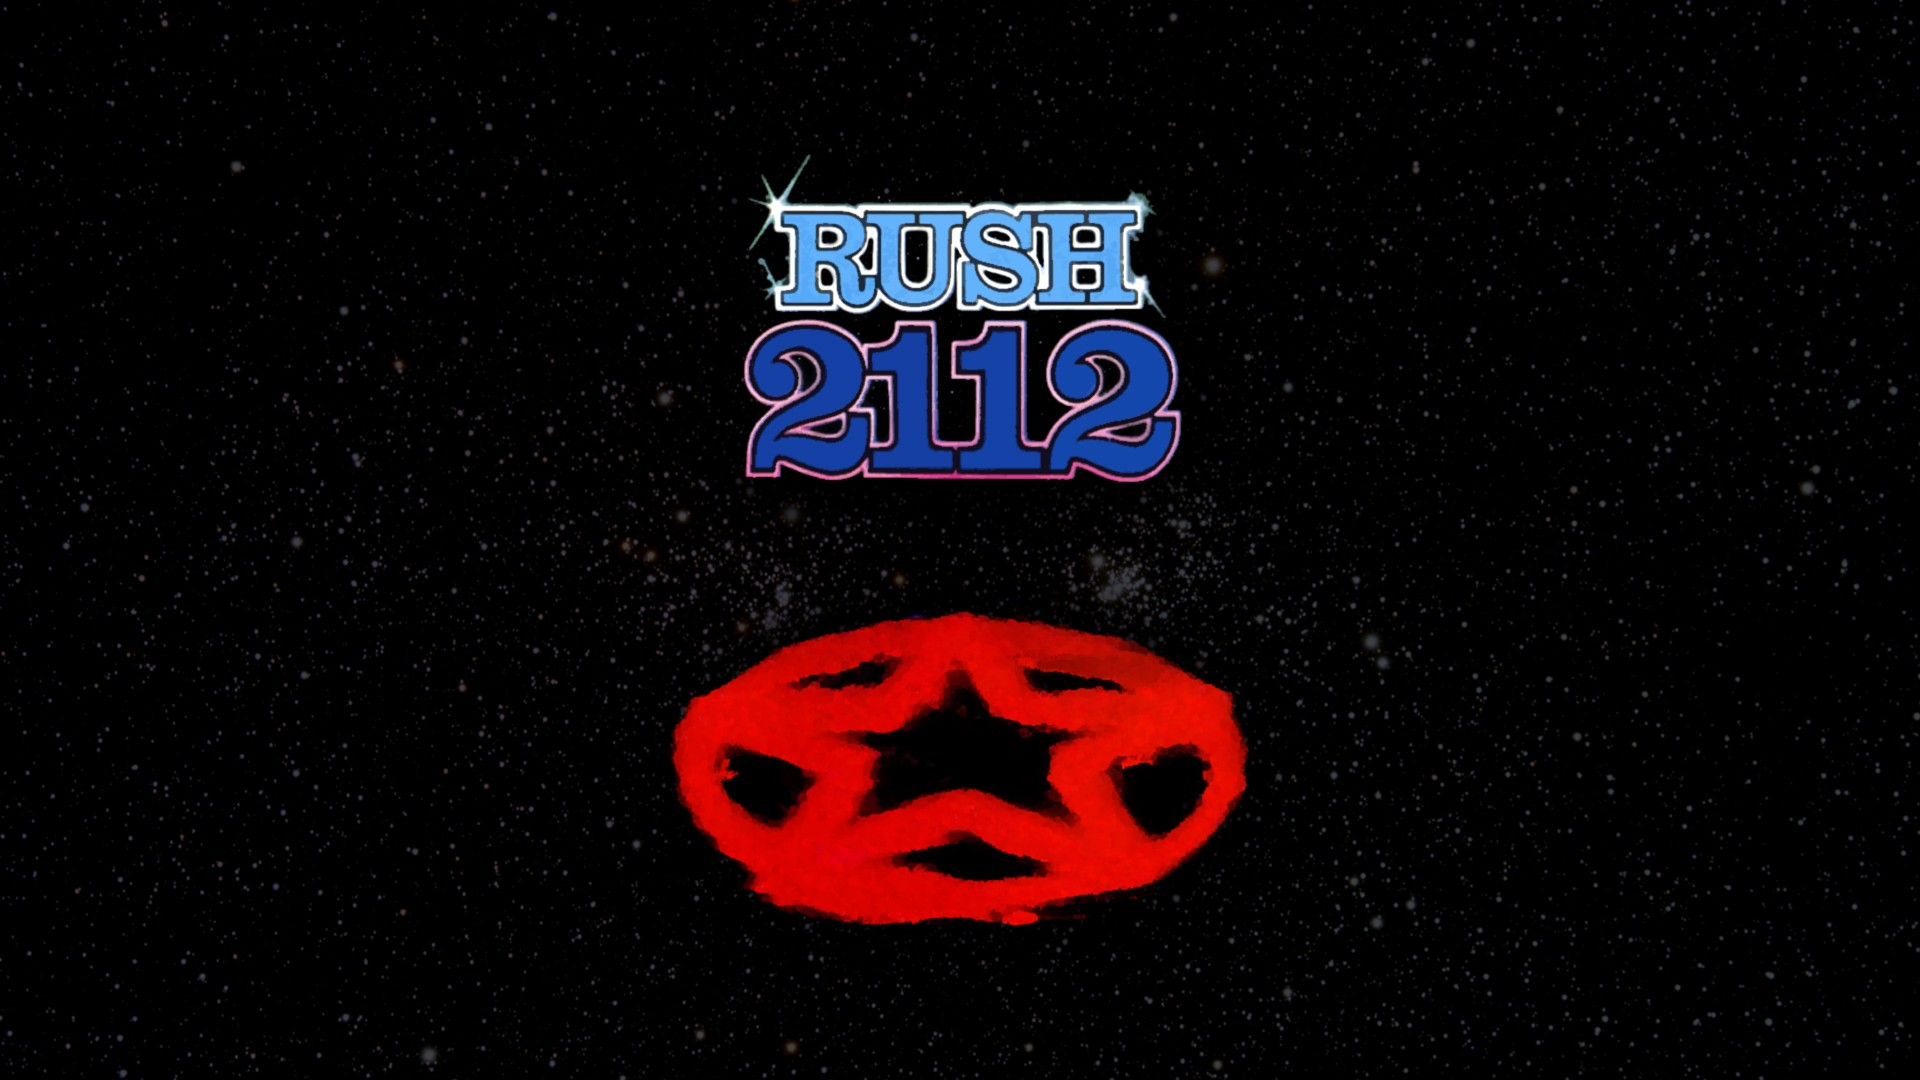 Rush Band Wallpaper 1920x1080